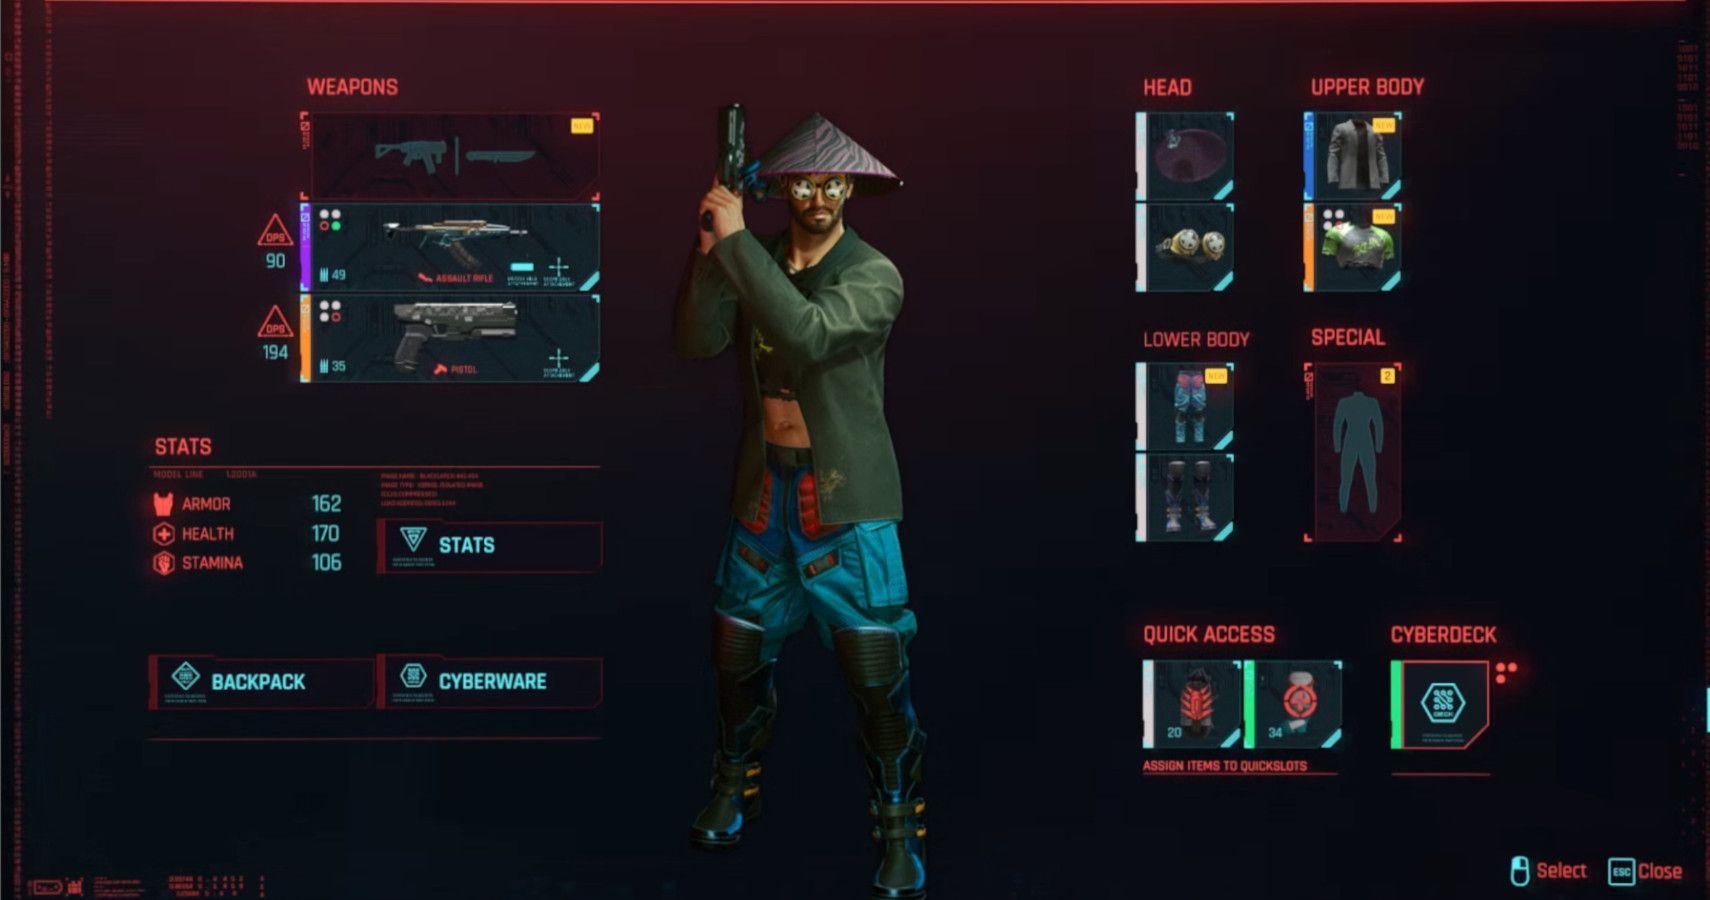 Cyberpunk 2077: I'm Sick Of Dressing Like An Idiot Just To Max My Stats